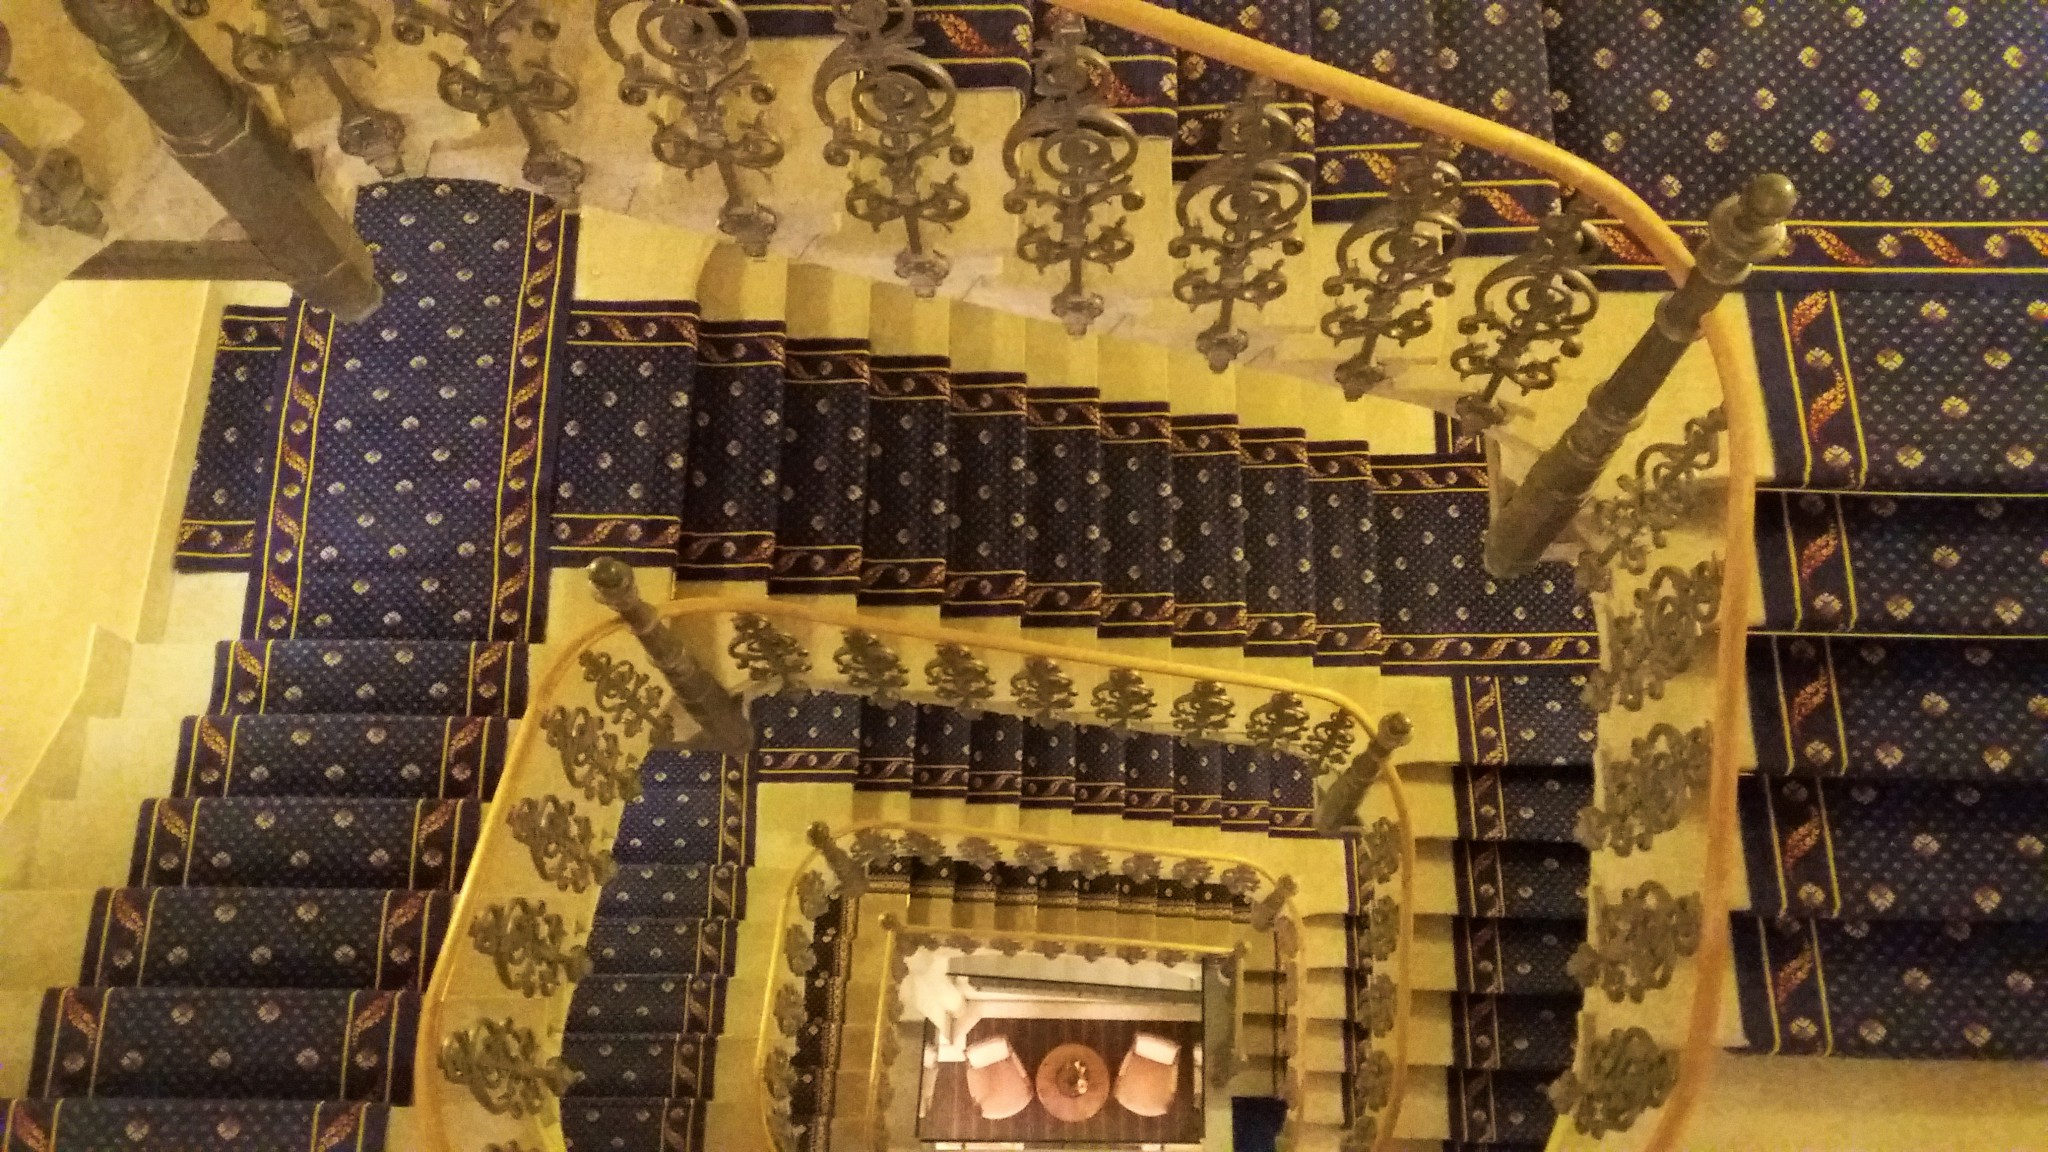 Grand Hotel Kronenhof interior